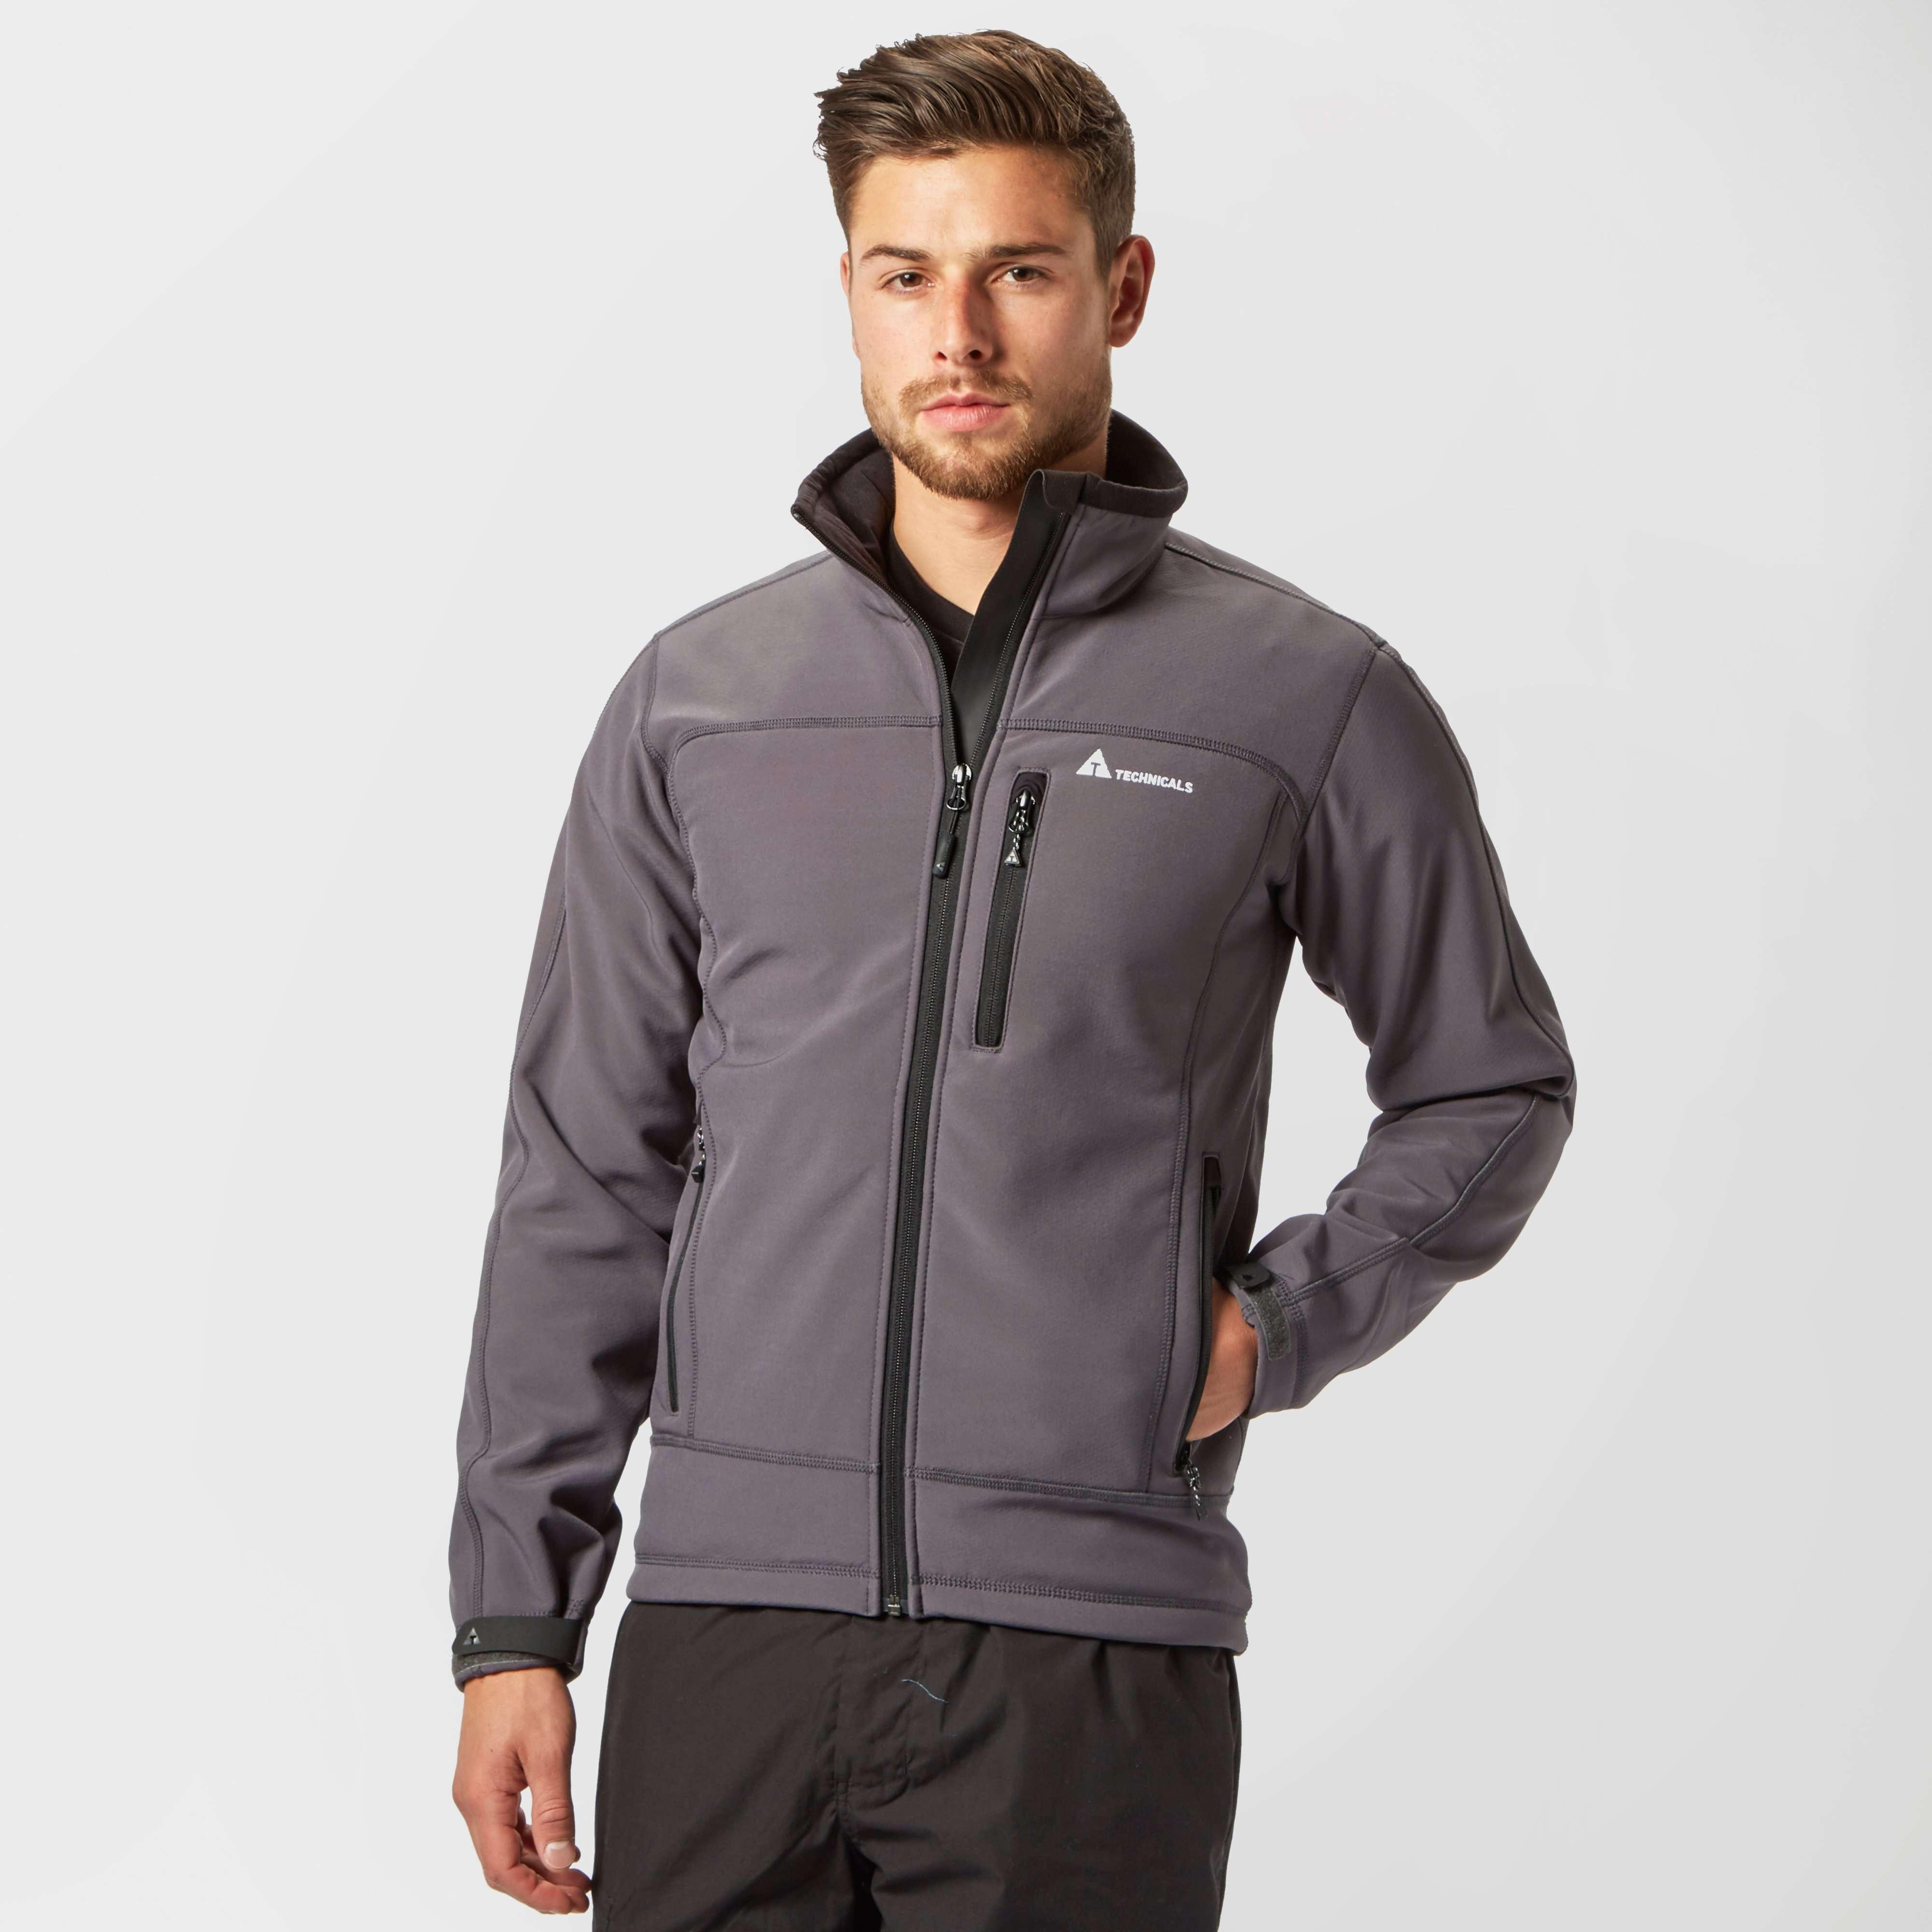 TECHNICALS Men's Electron Softshell Jacket